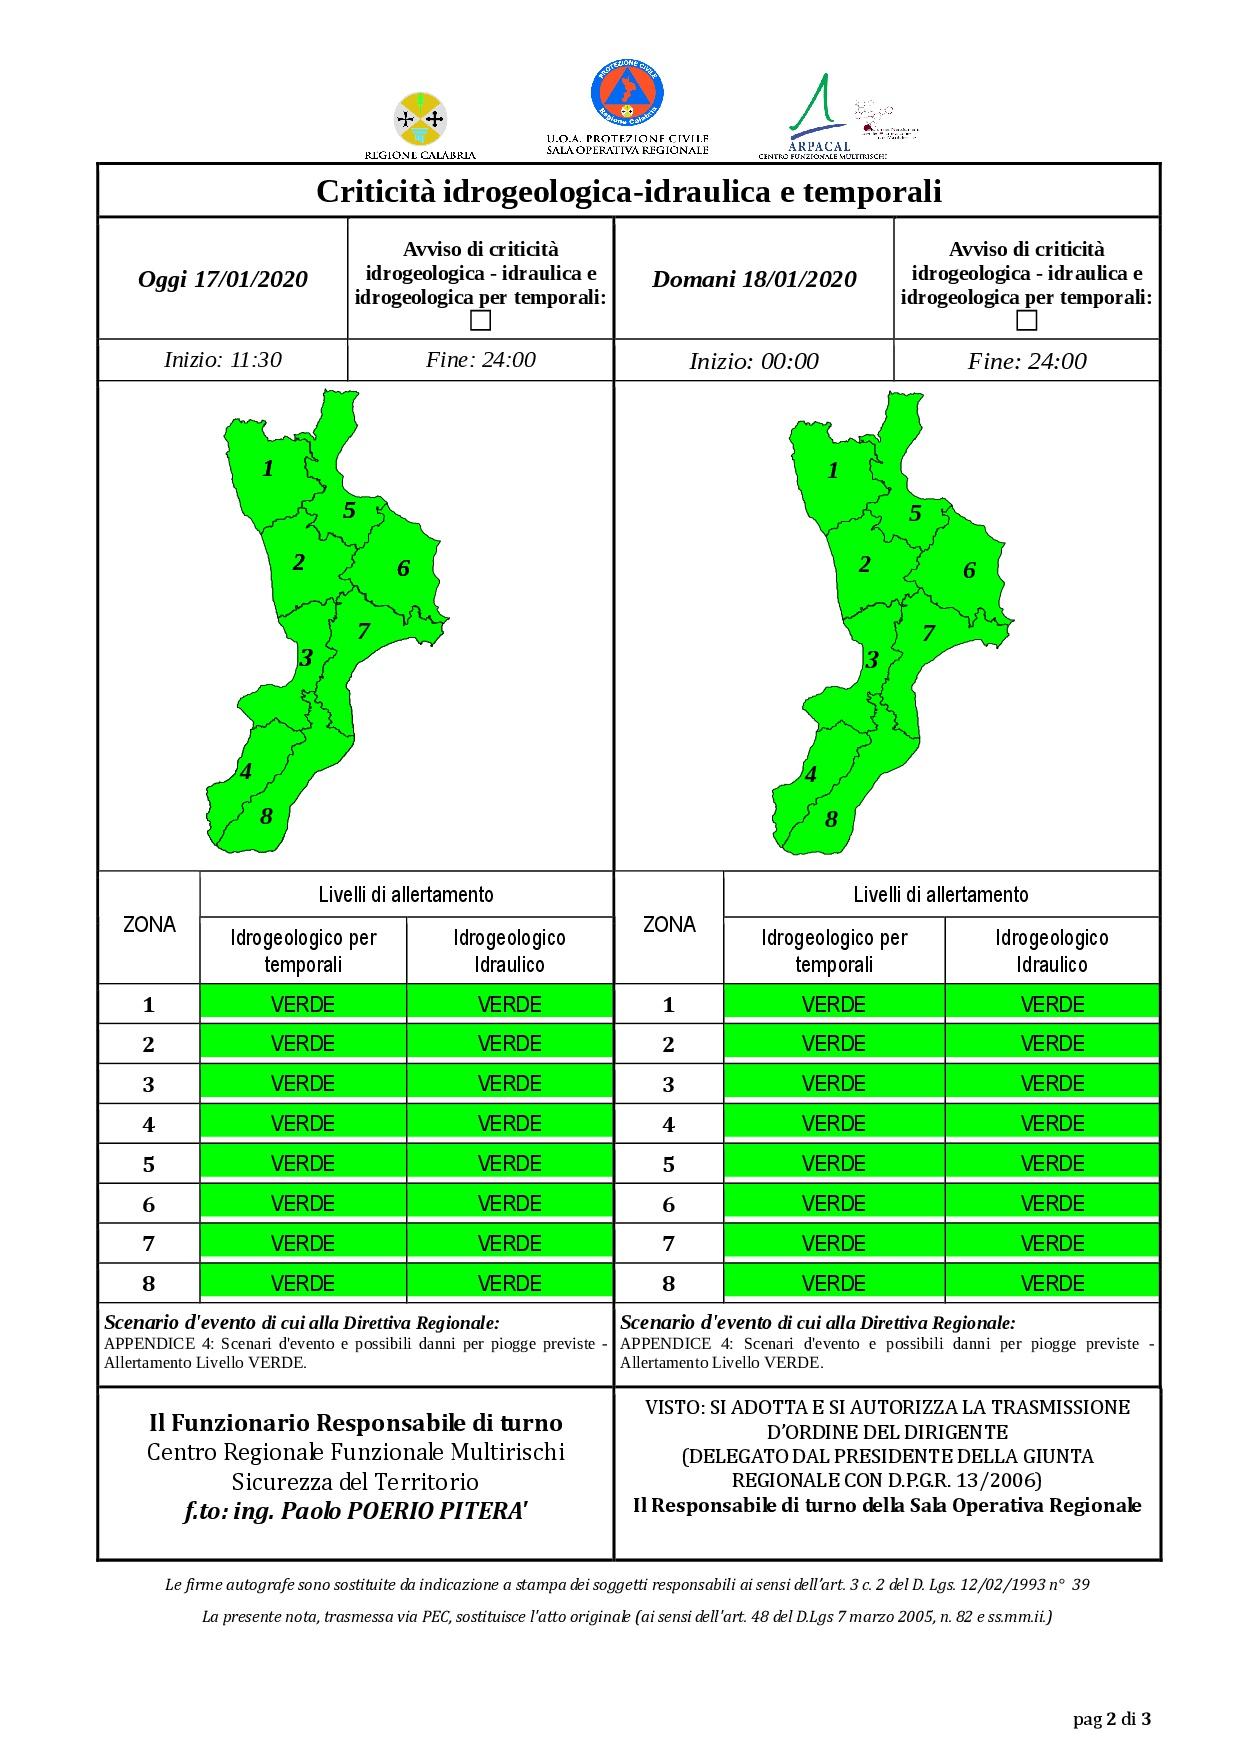 Criticità idrogeologica-idraulica e temporali in Calabria 17-01-2020